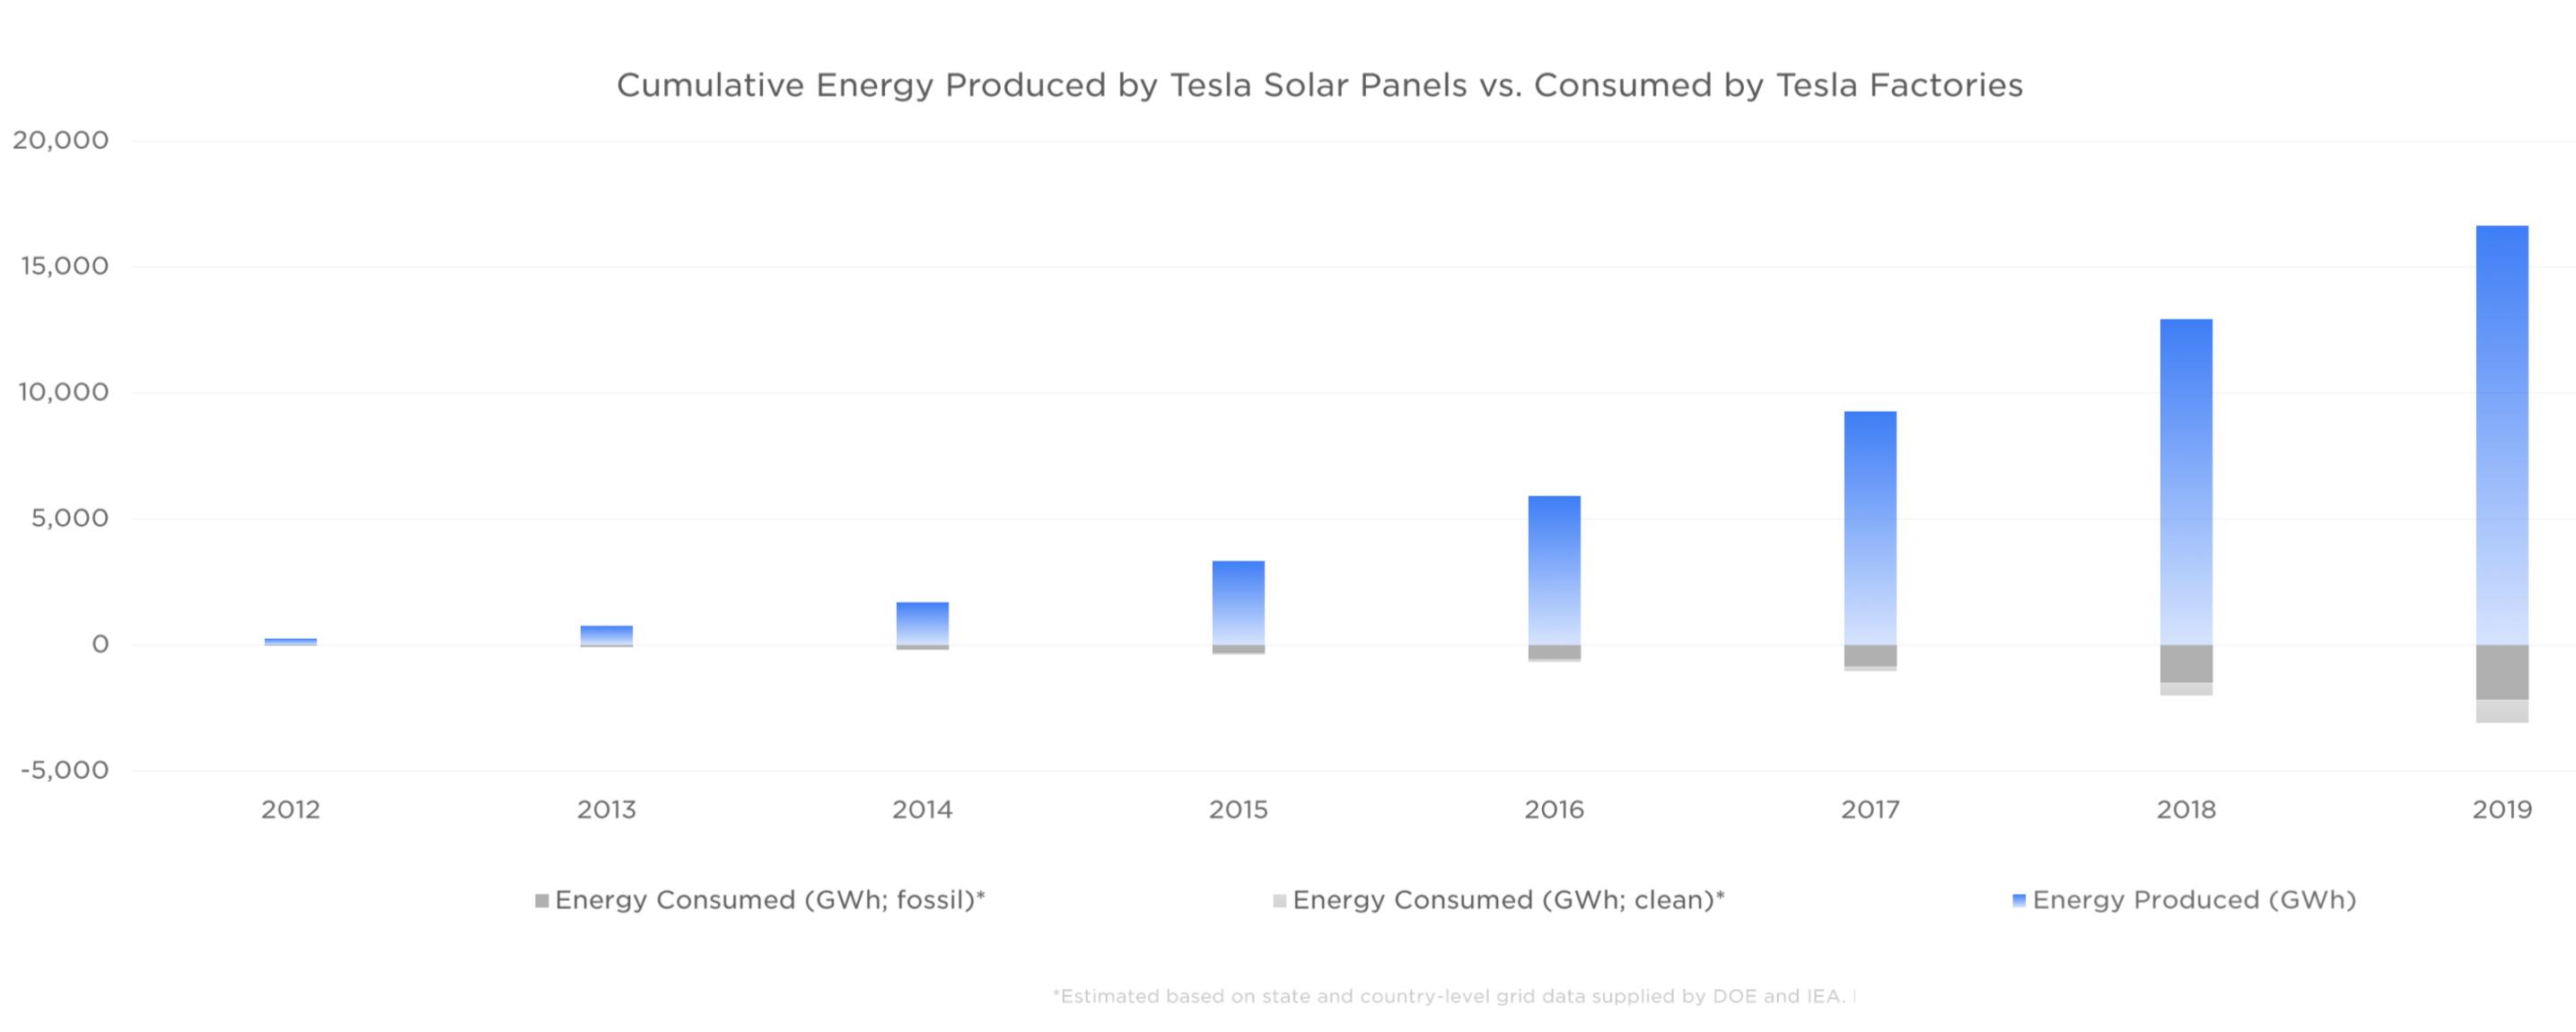 TESLA FACTORY ENERGY CONSUMPTION IMPACT REPORT 2020